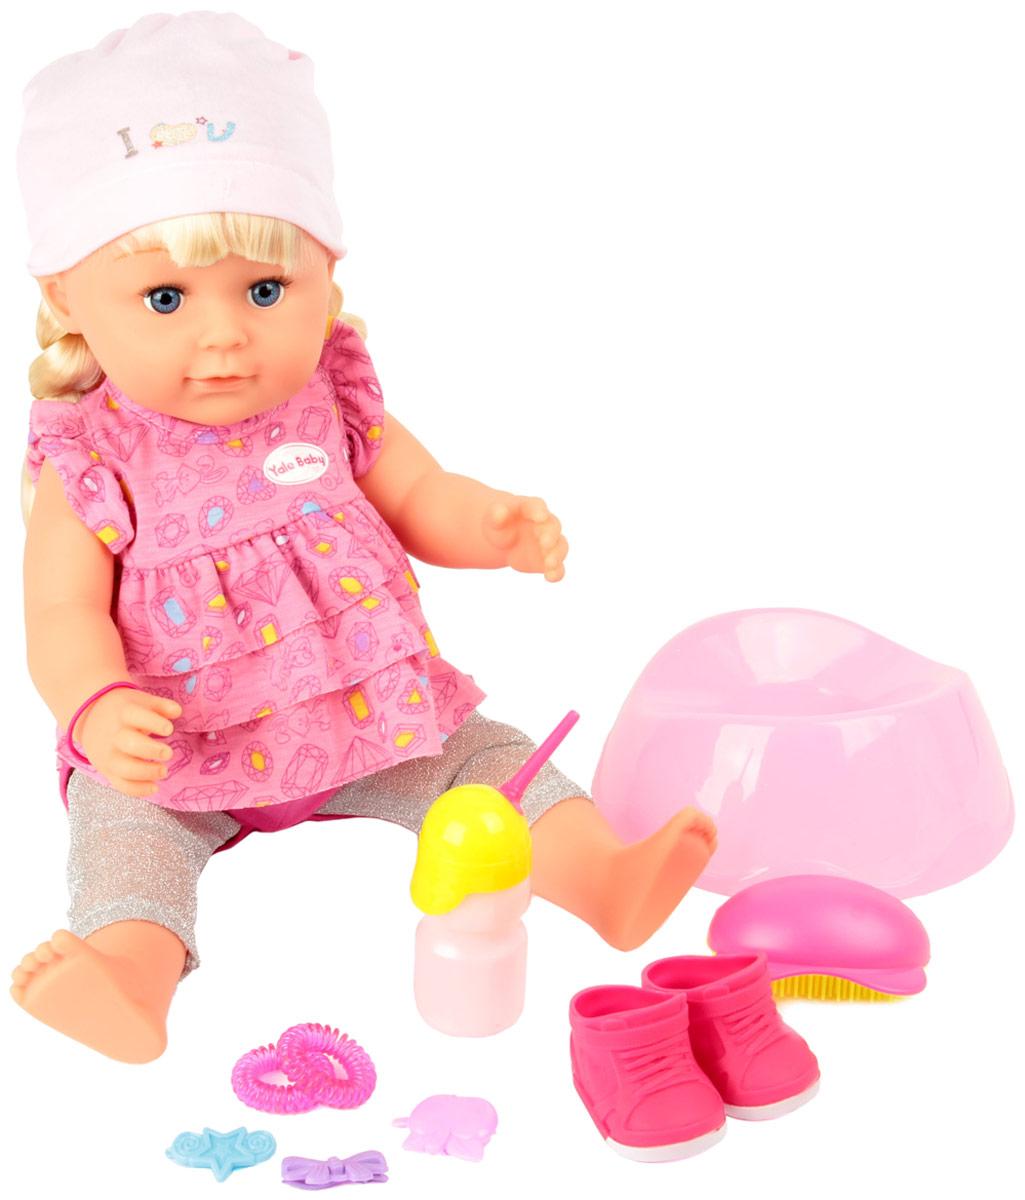 Lisa Jane Кукла Рита 46 см кукла lisa jane mami интерактивная в голубом 40 см